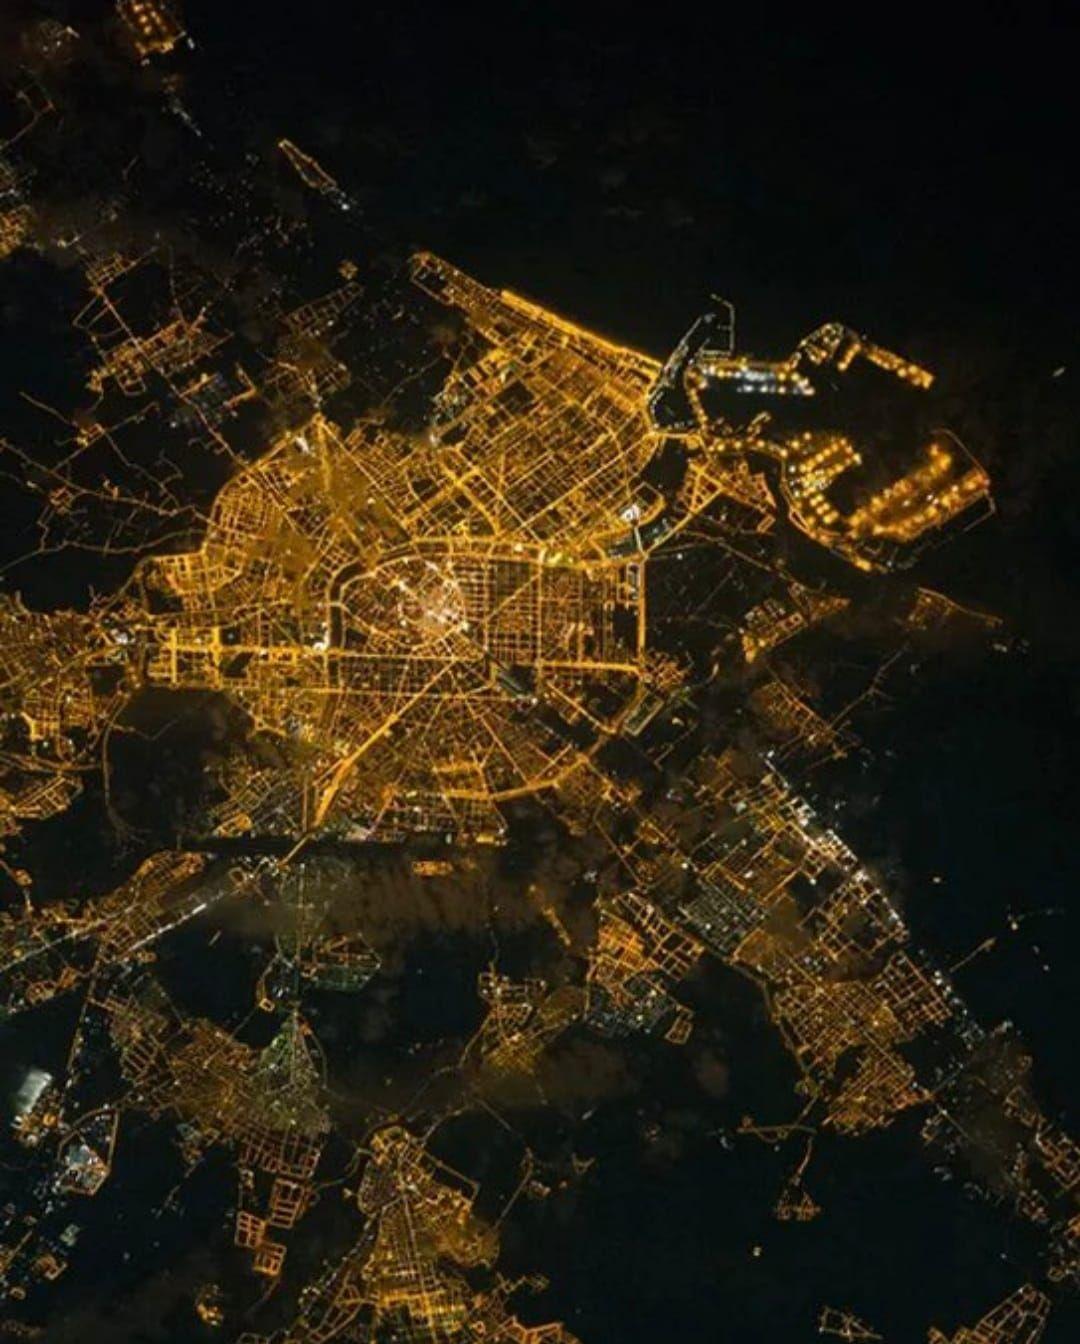 valencia-noche-nasa-espacio.jpg